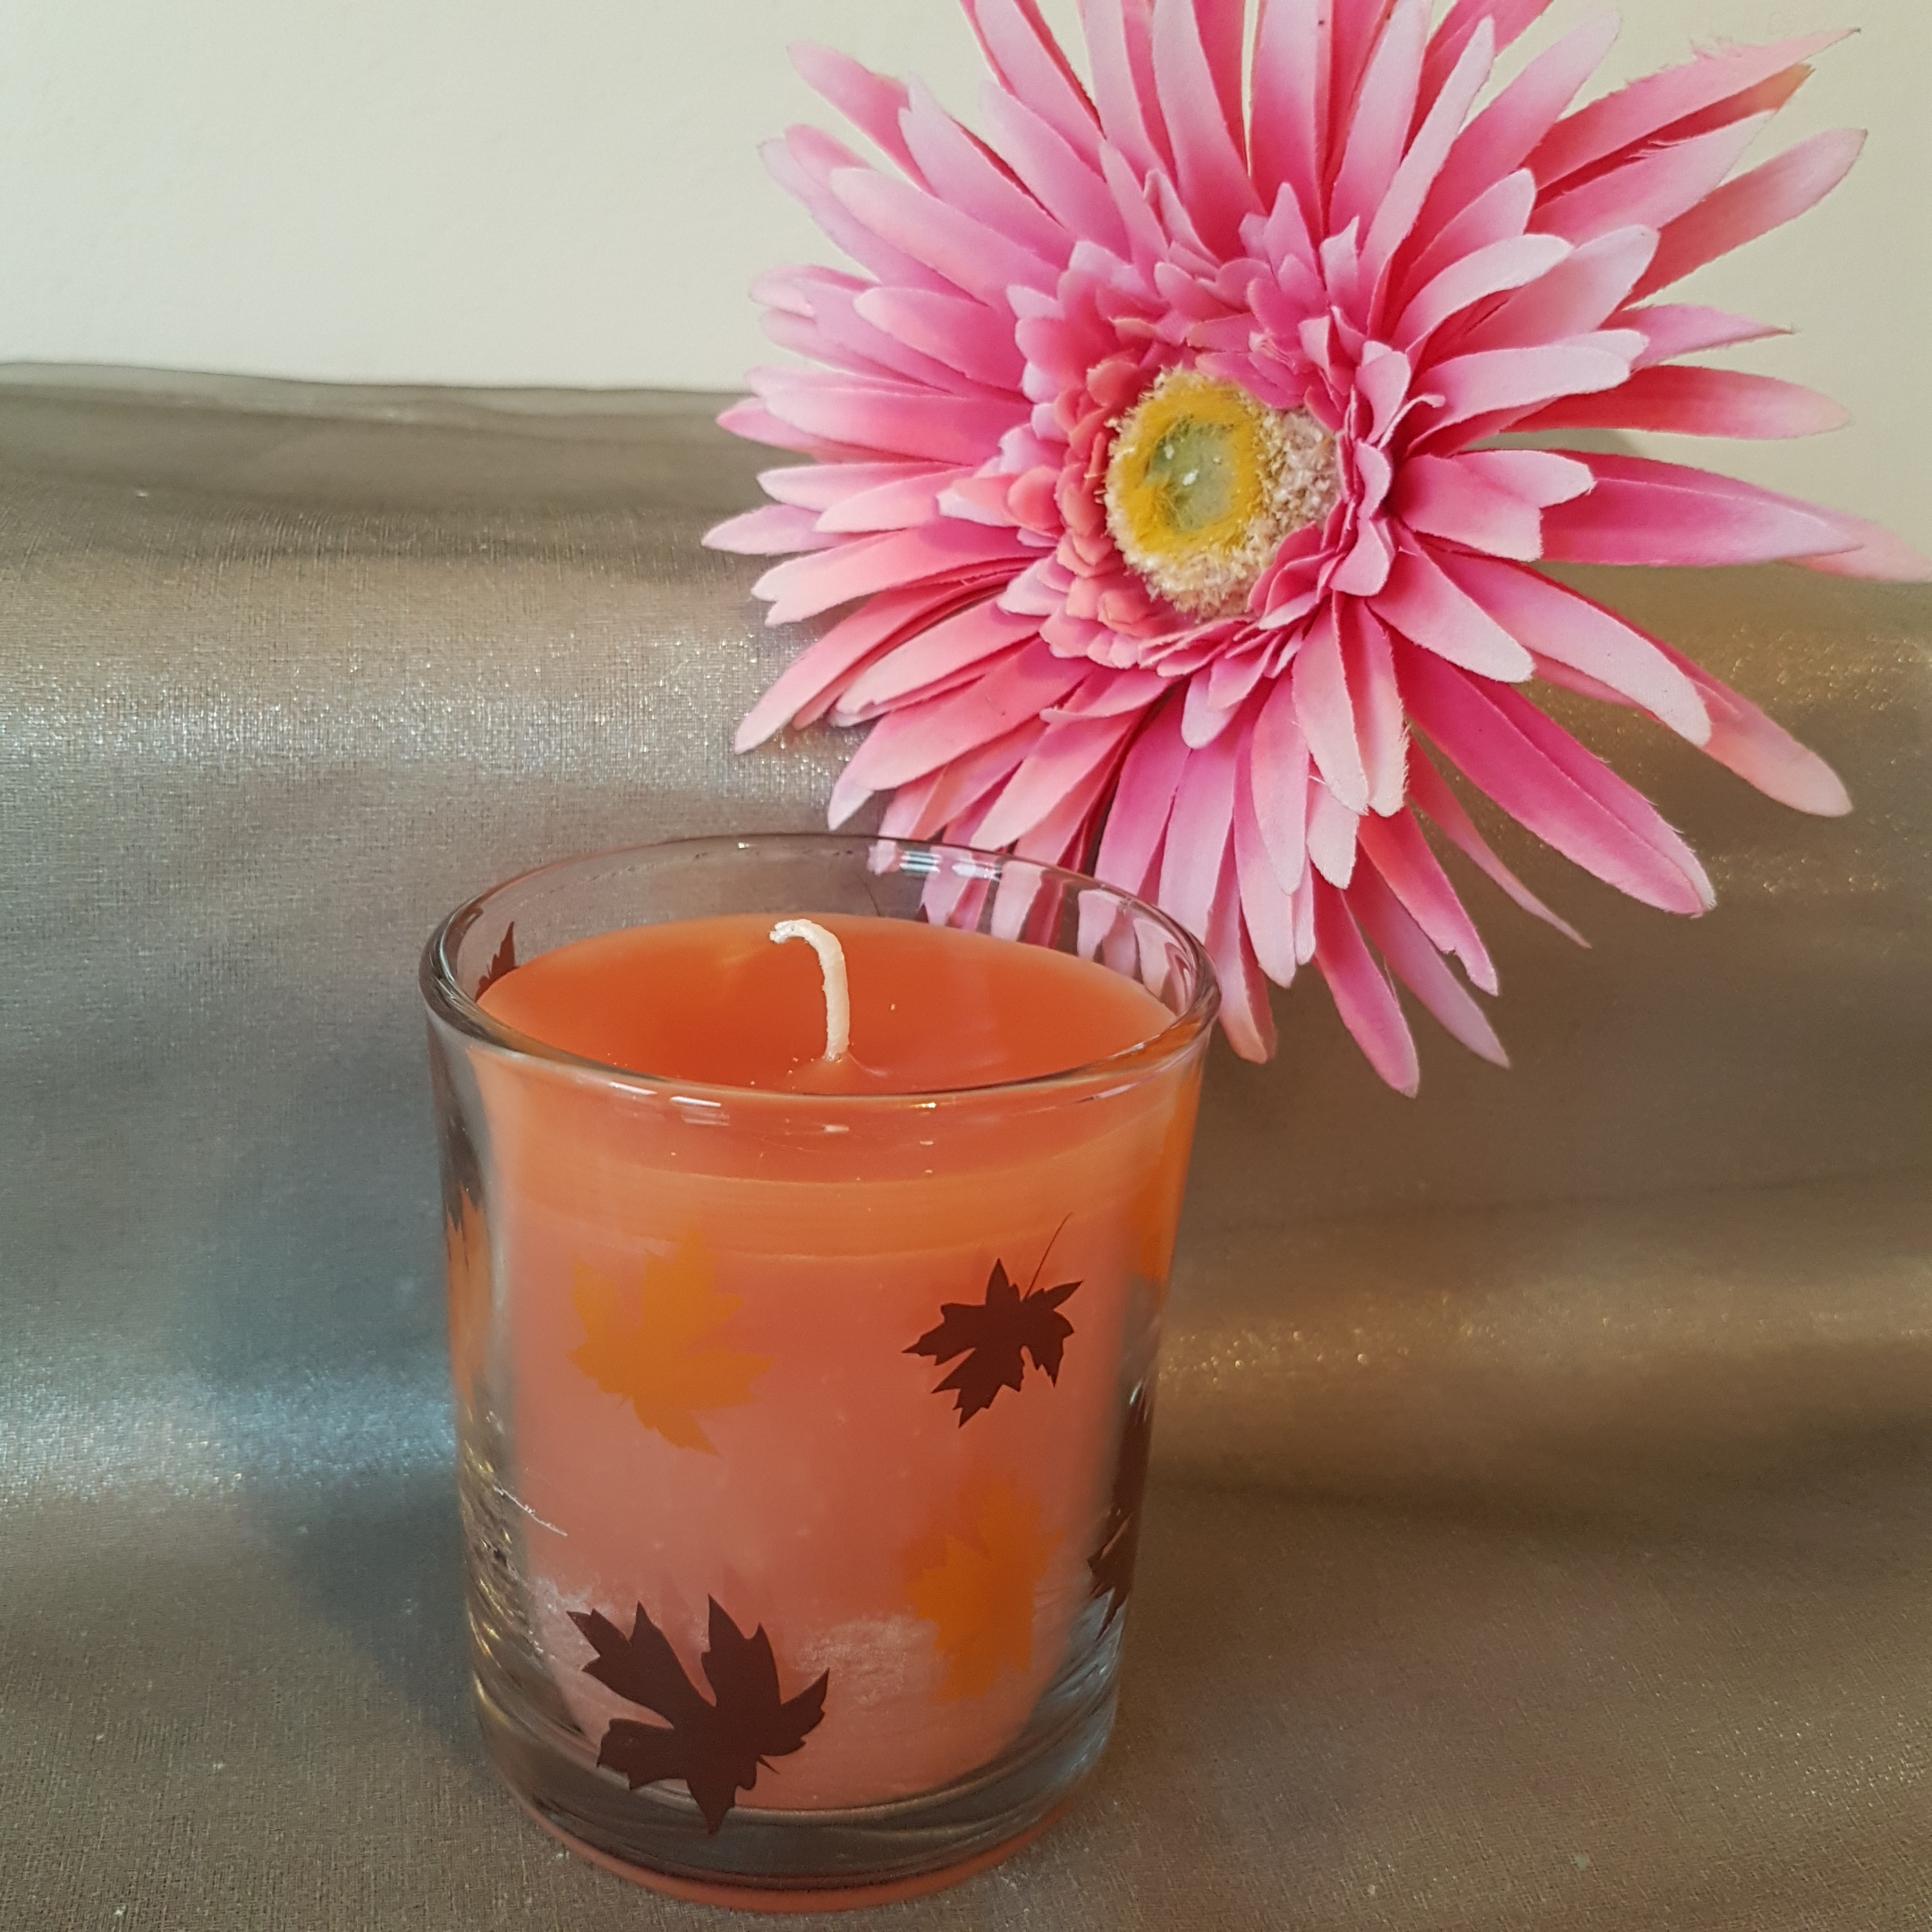 Glaskerze orange Glas mit Blätter